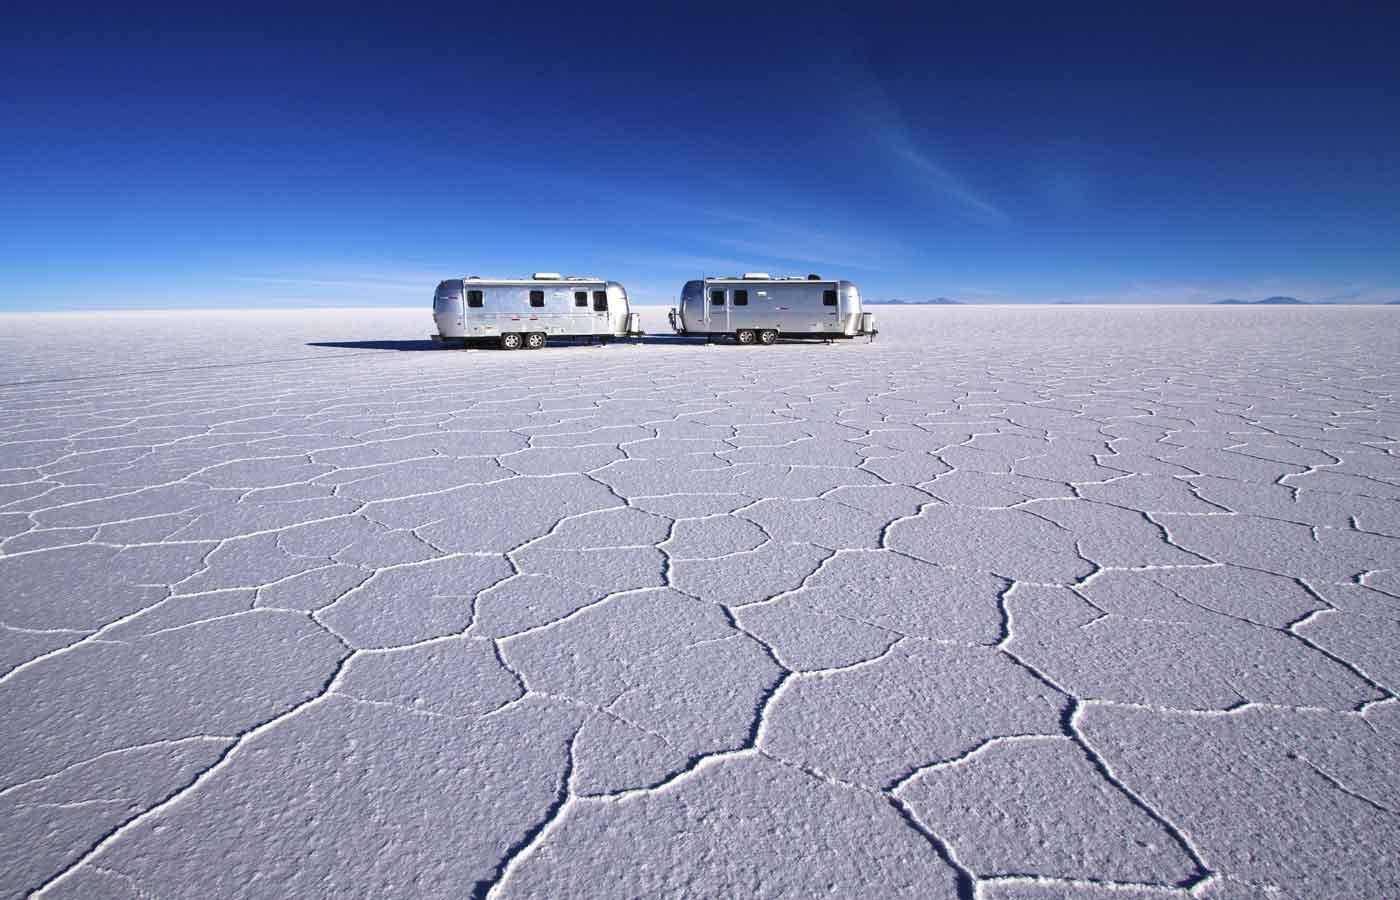 Deluxe Airstream Campers, Uyuni Salt Flats, Bolivia